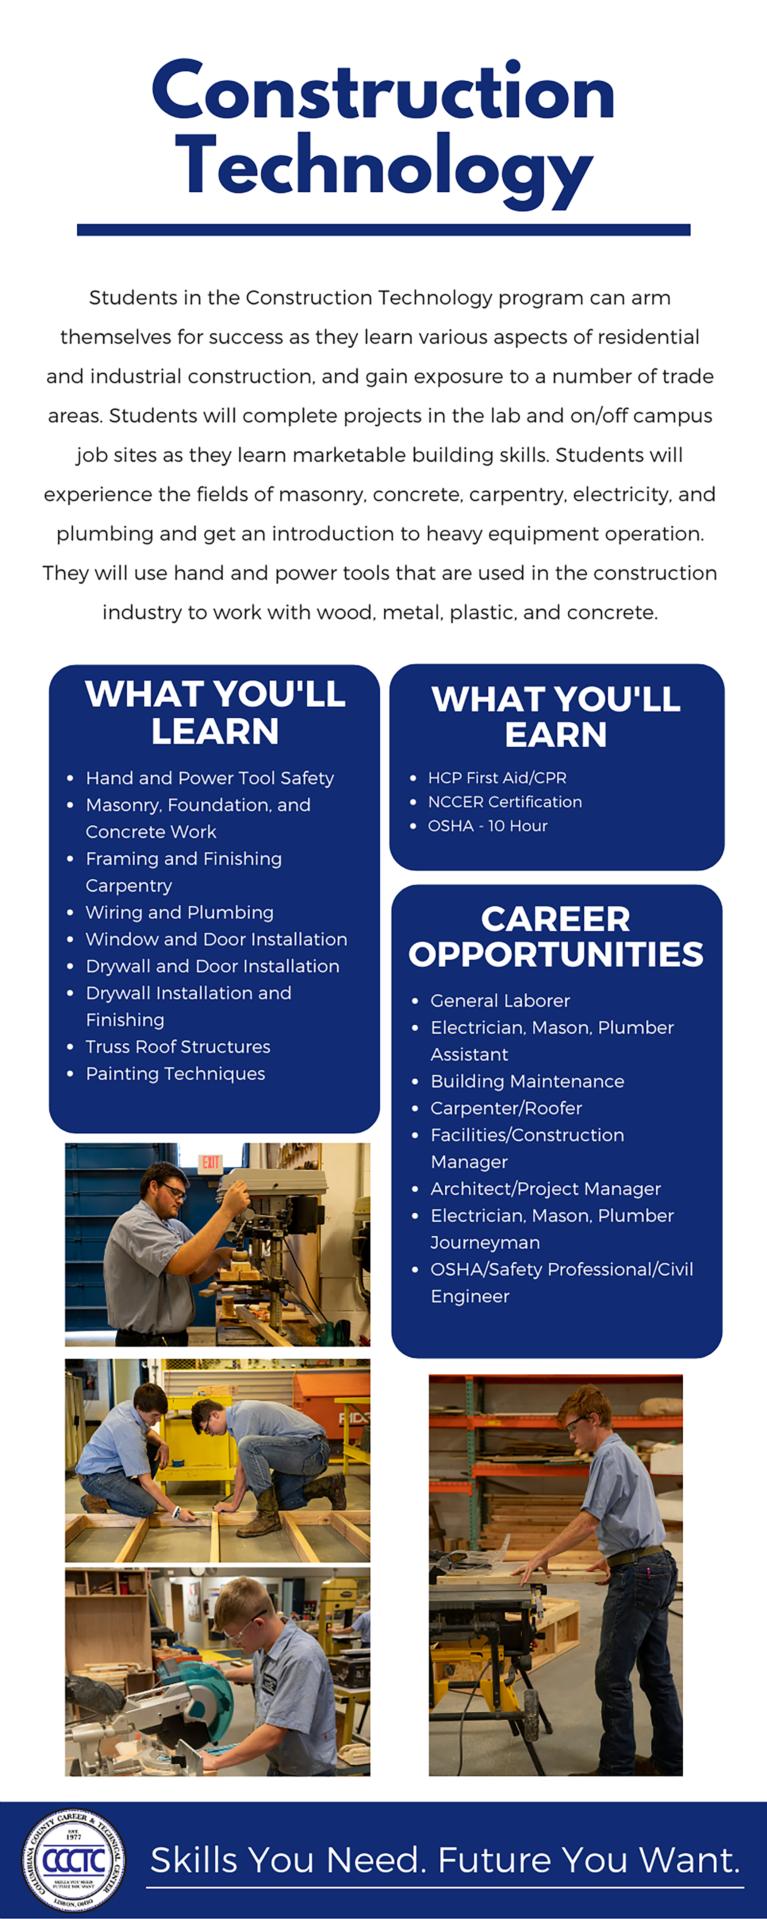 Construction Technology Program Info